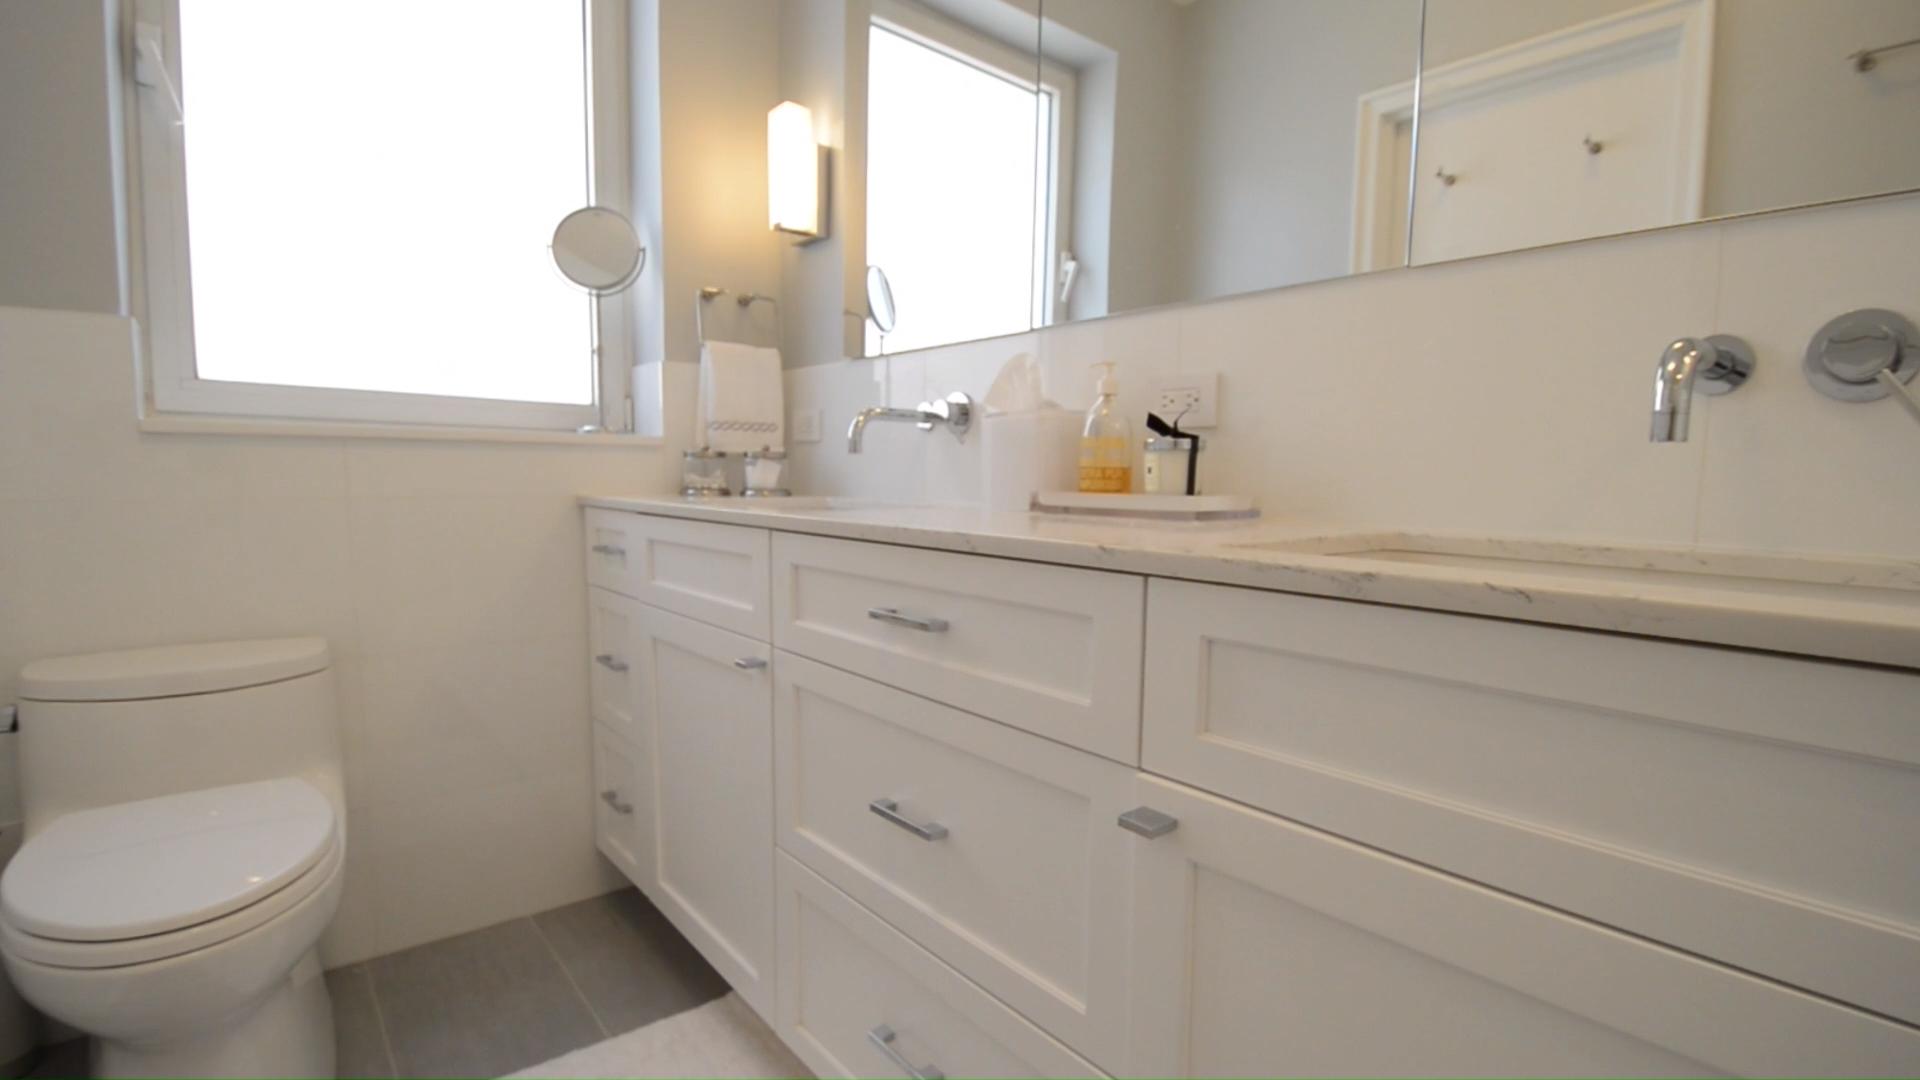 Photo of Remodel Upper East Side bathroom